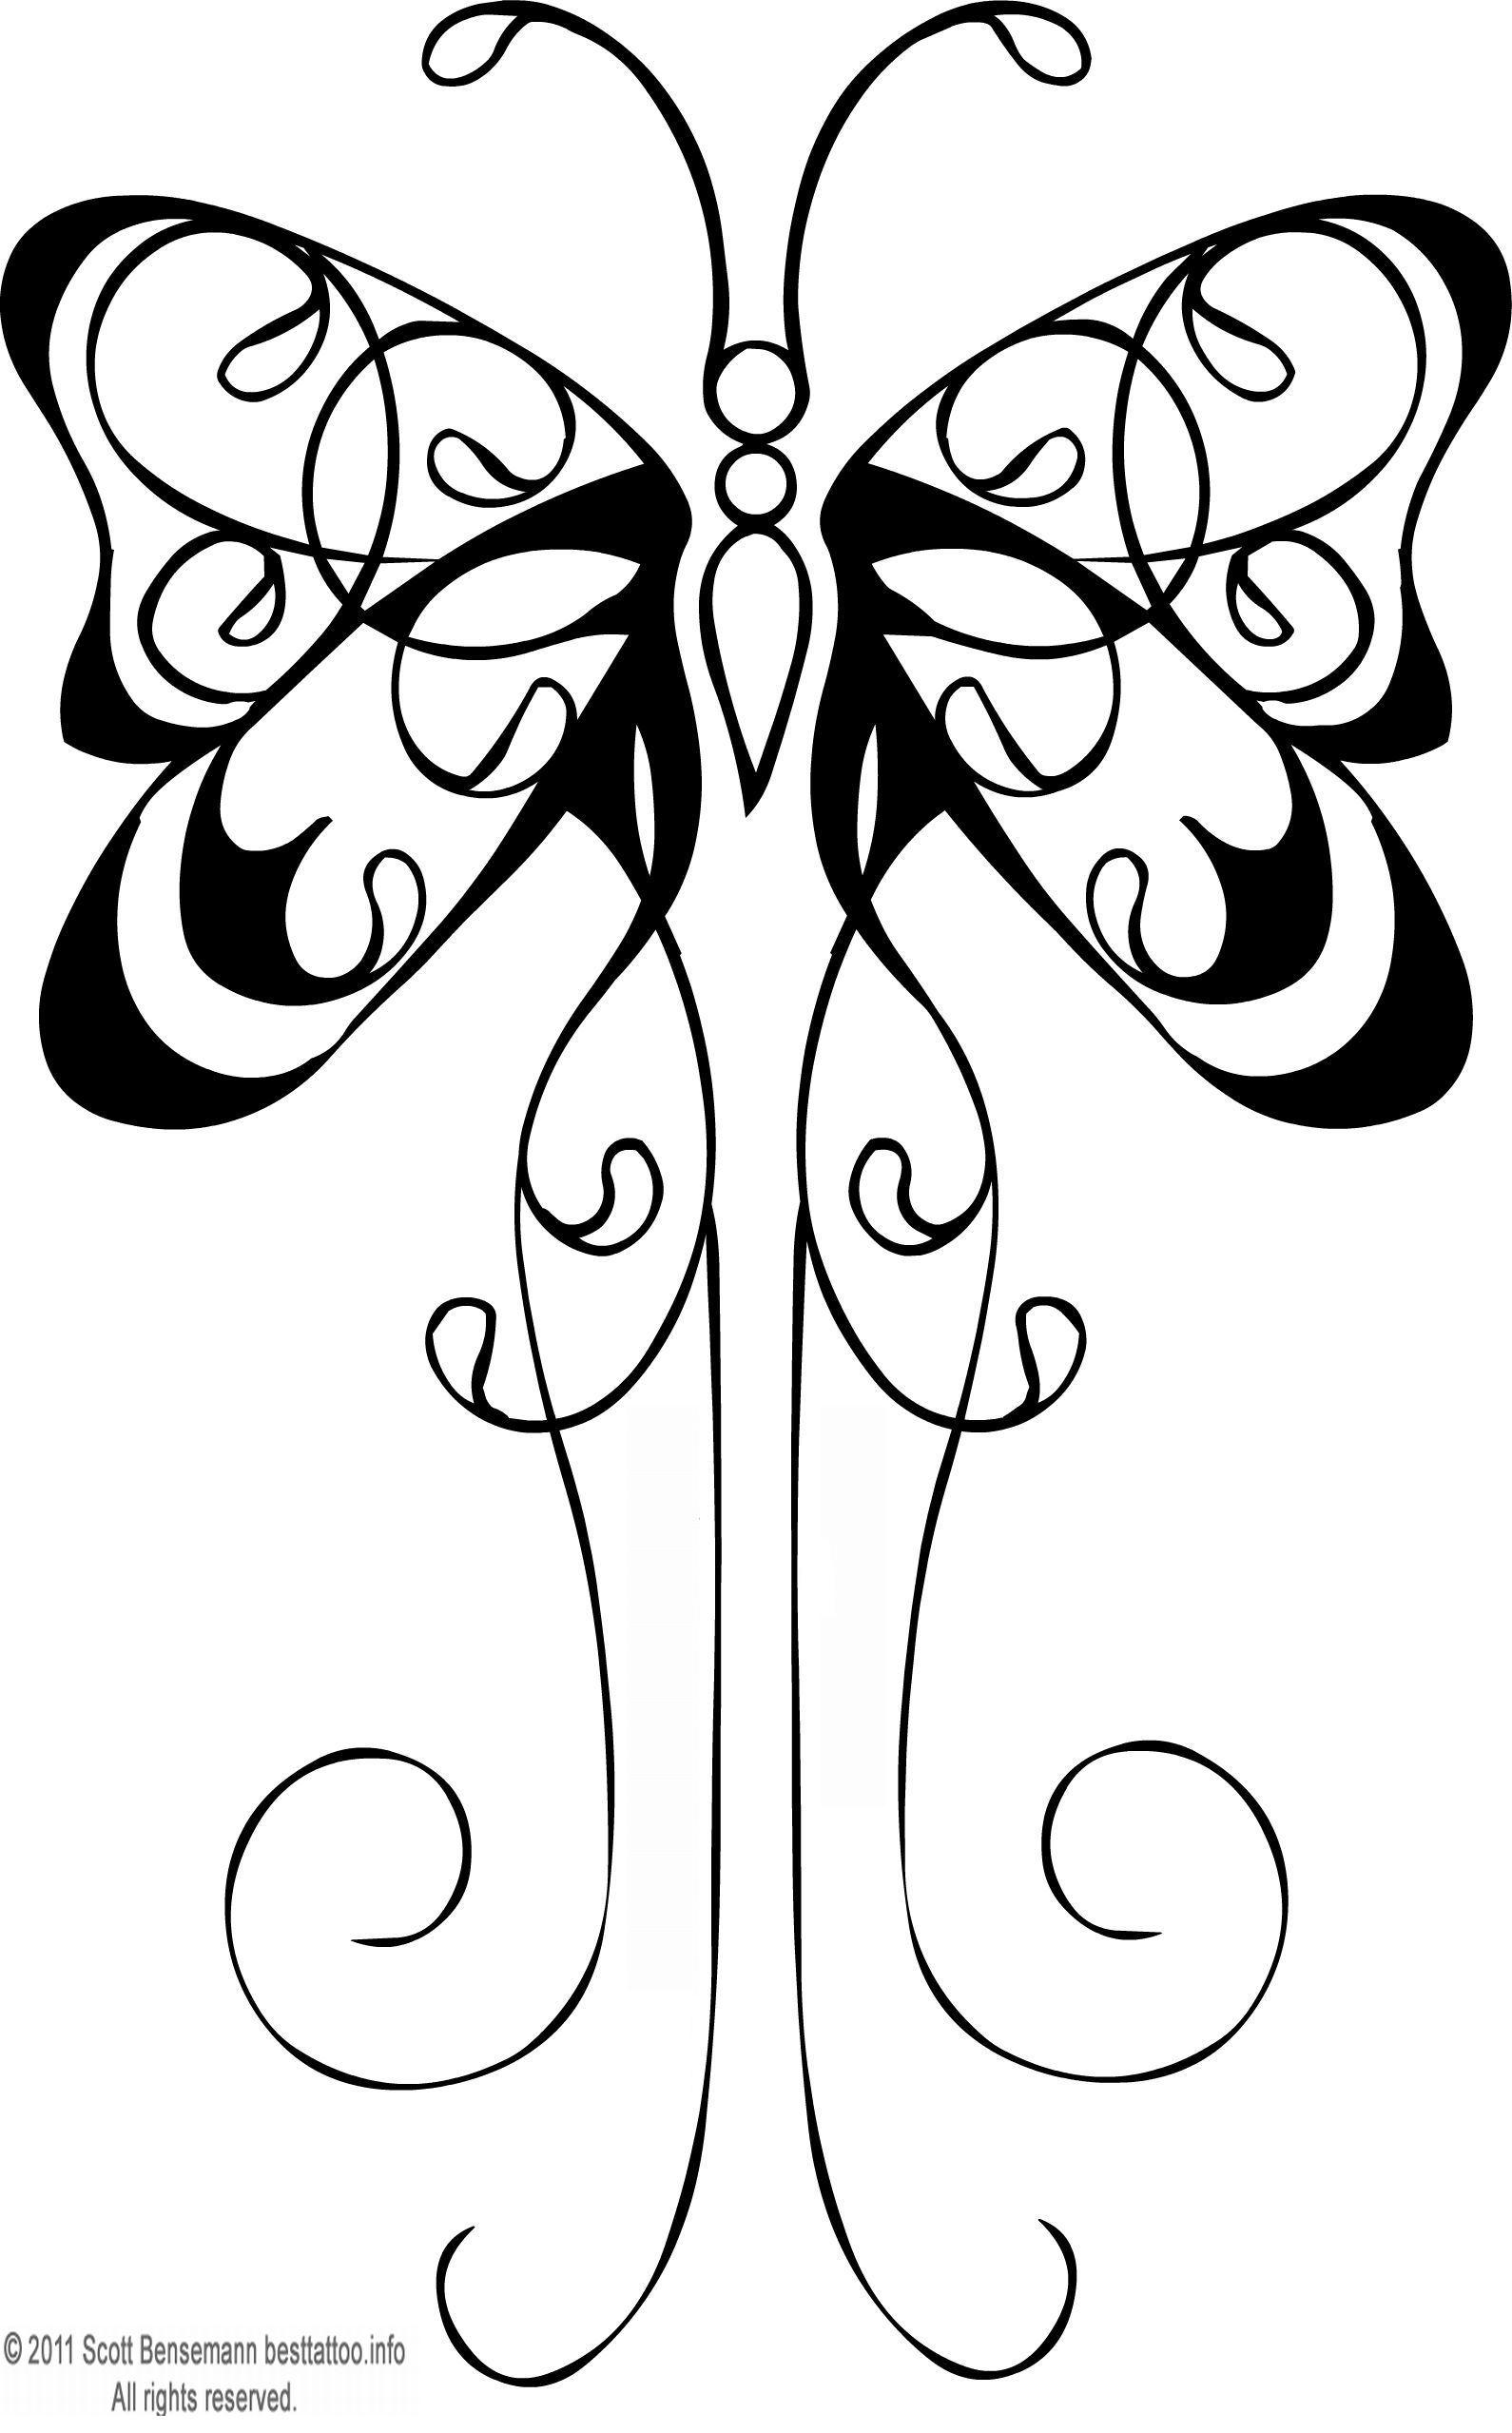 black stars tattoo designs clipart panda free clipart images. Black Bedroom Furniture Sets. Home Design Ideas